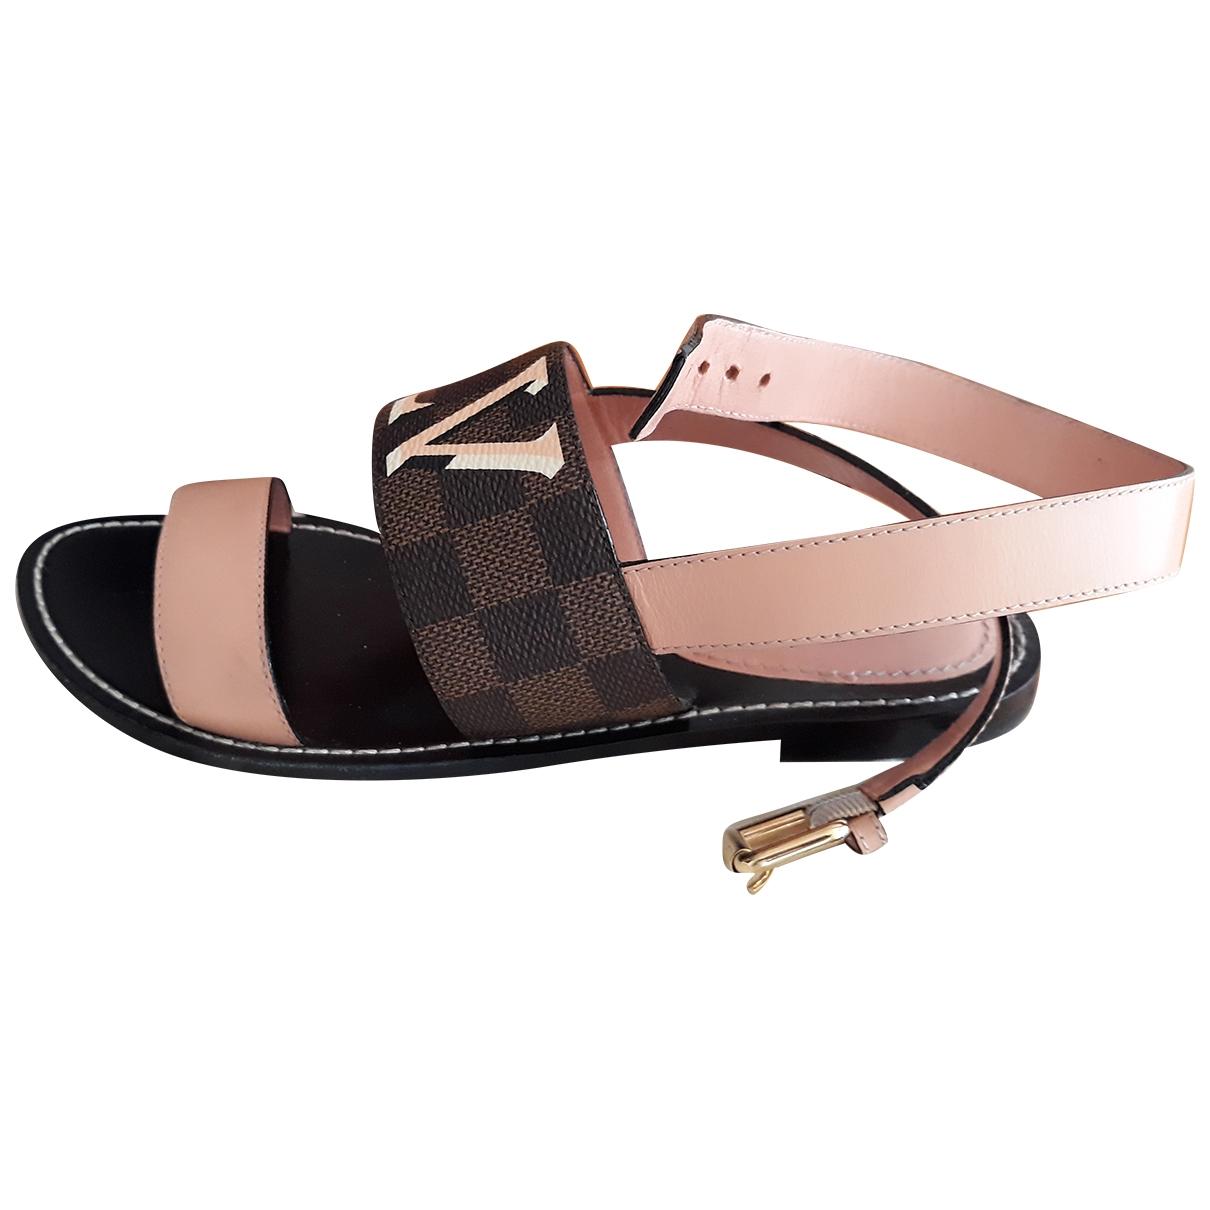 Sandalias romanas Passenger de Cuero Louis Vuitton